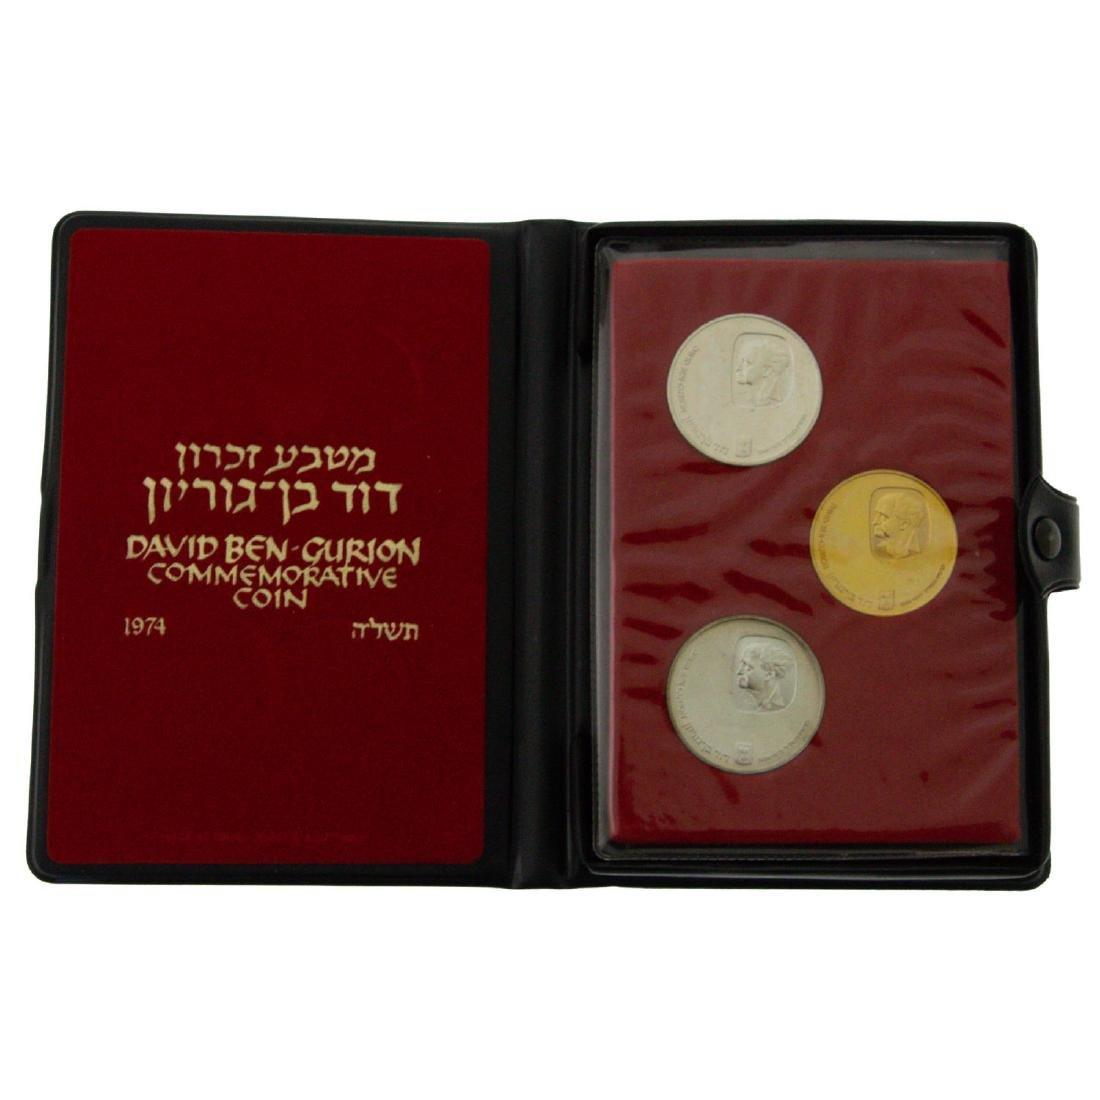 David Ben-Gurion Commemorative Gold and Silver Coin